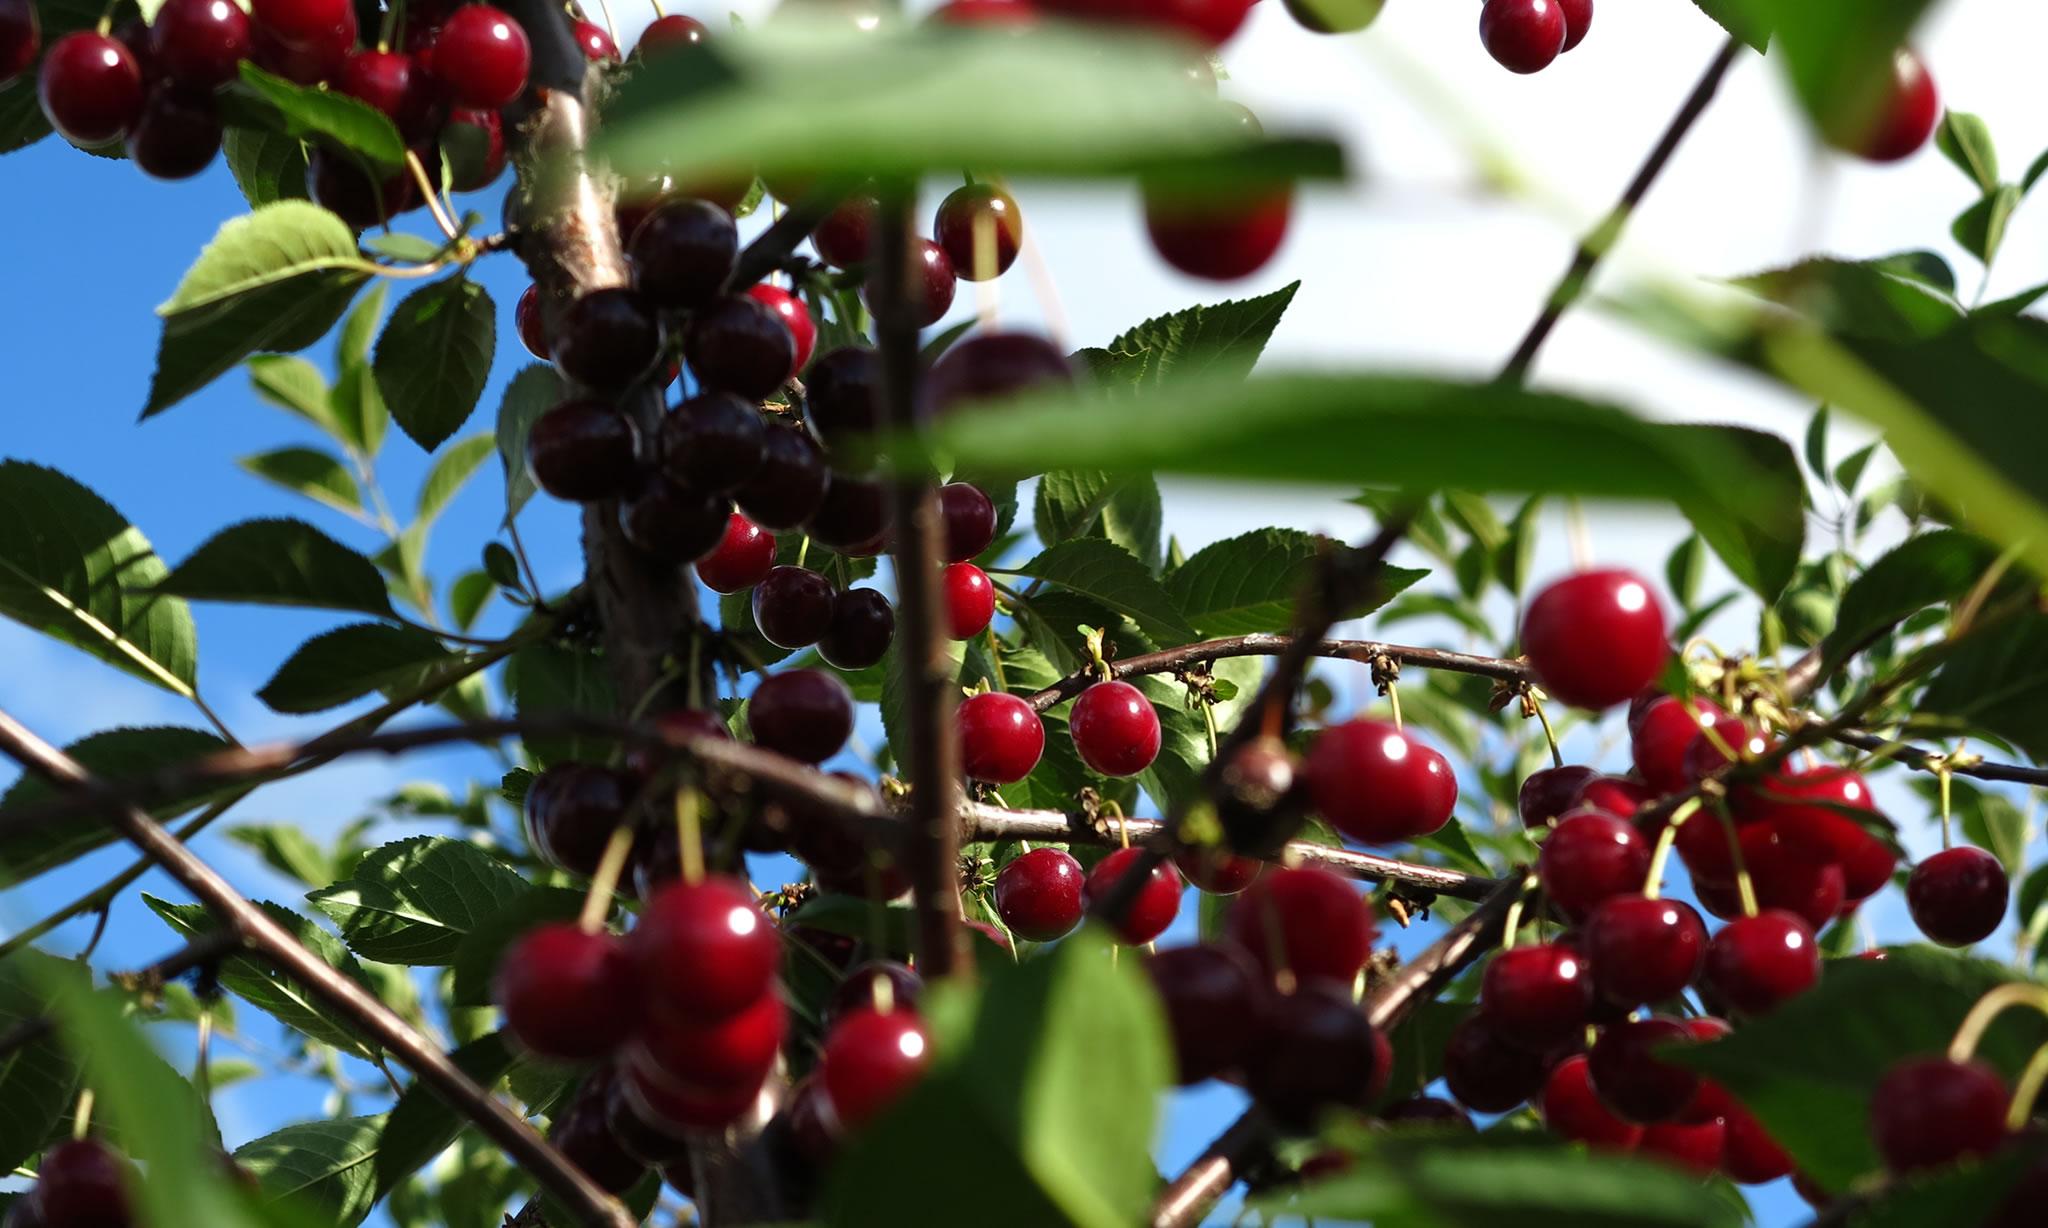 Cherry plantations in Kriftel